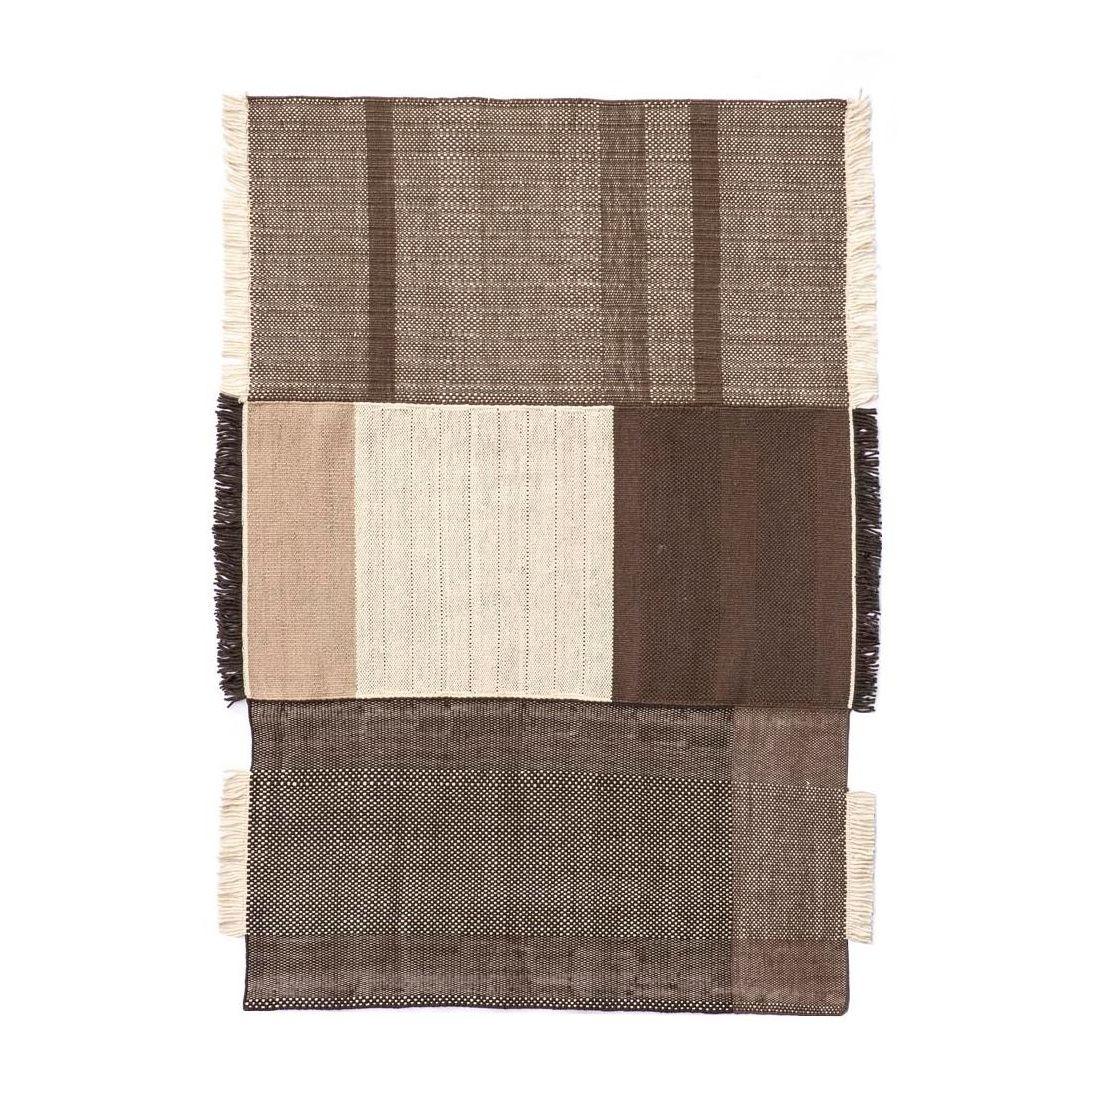 tres woll filz teppich 200x300cm nanimarquina. Black Bedroom Furniture Sets. Home Design Ideas